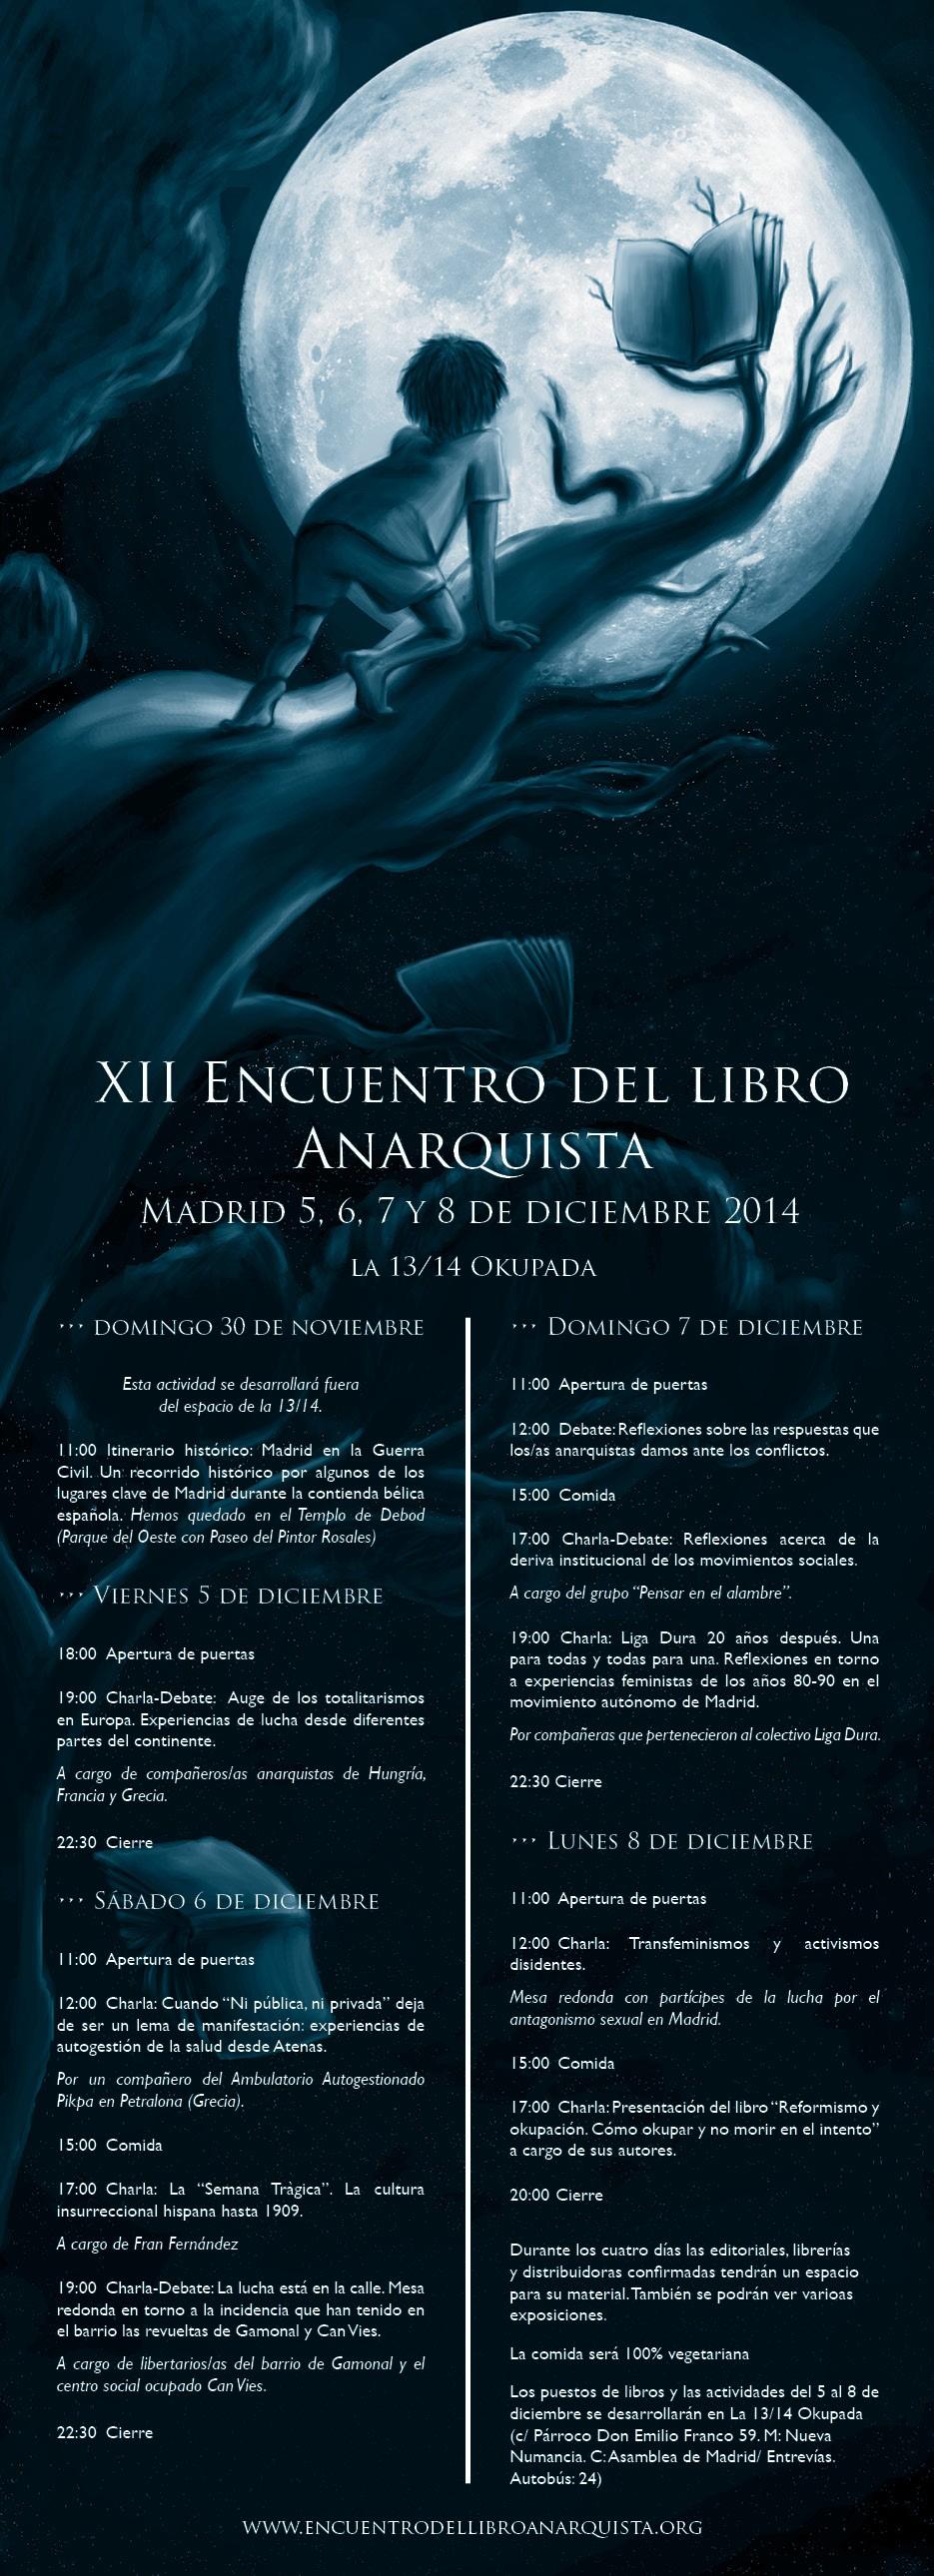 http://encuentrodellibroanarquista.org/feria12/wp-content/uploads/2014/10/encuentro14justificado2.jpg